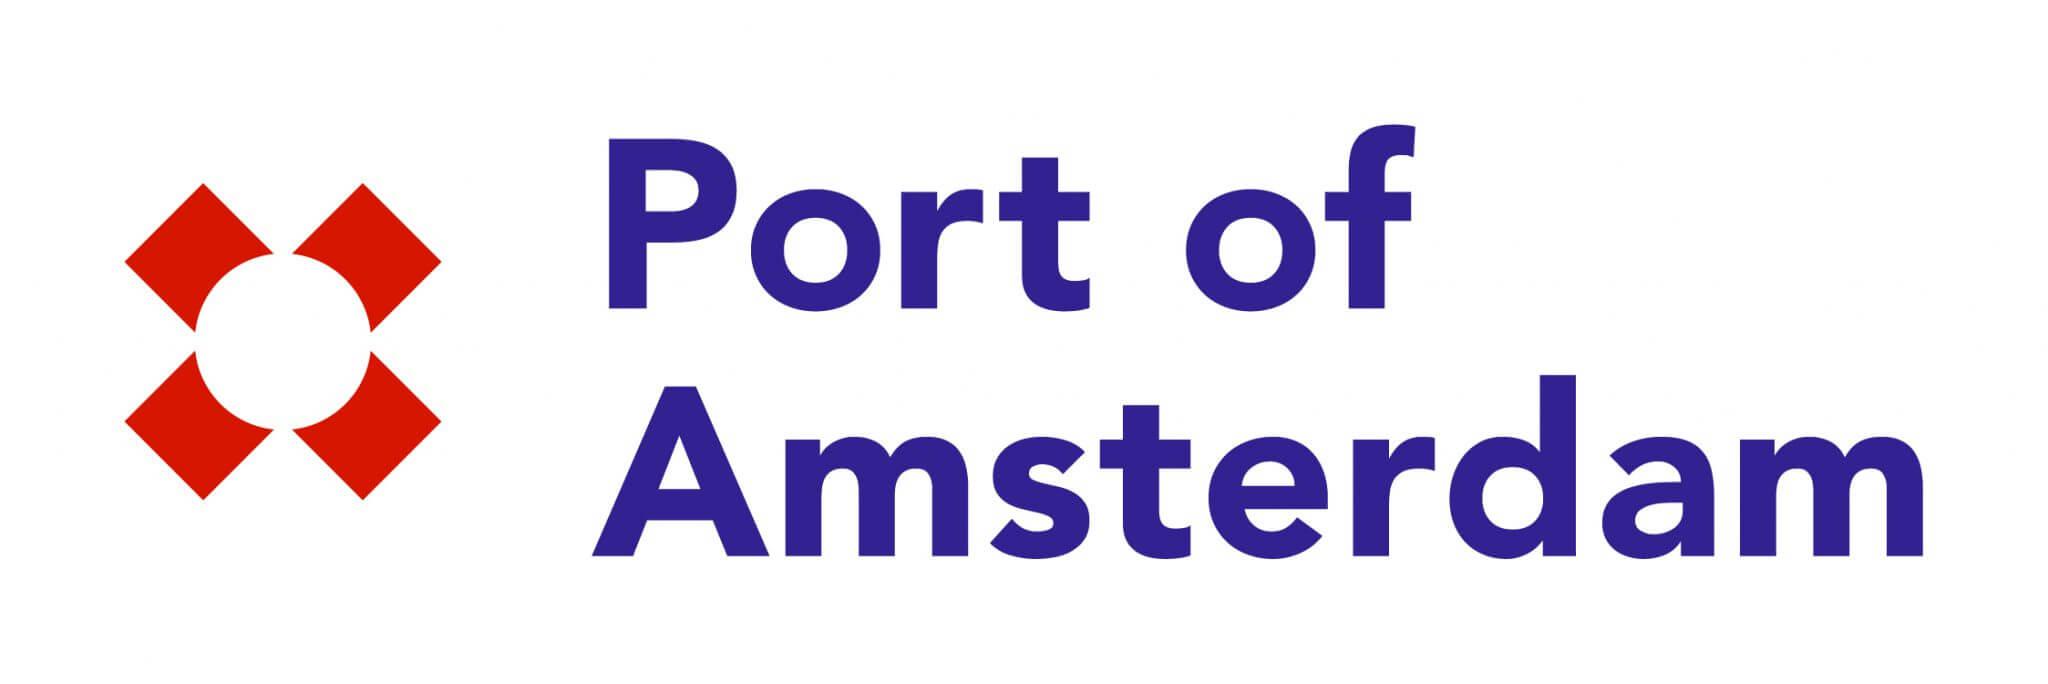 Port of amsterdam-image